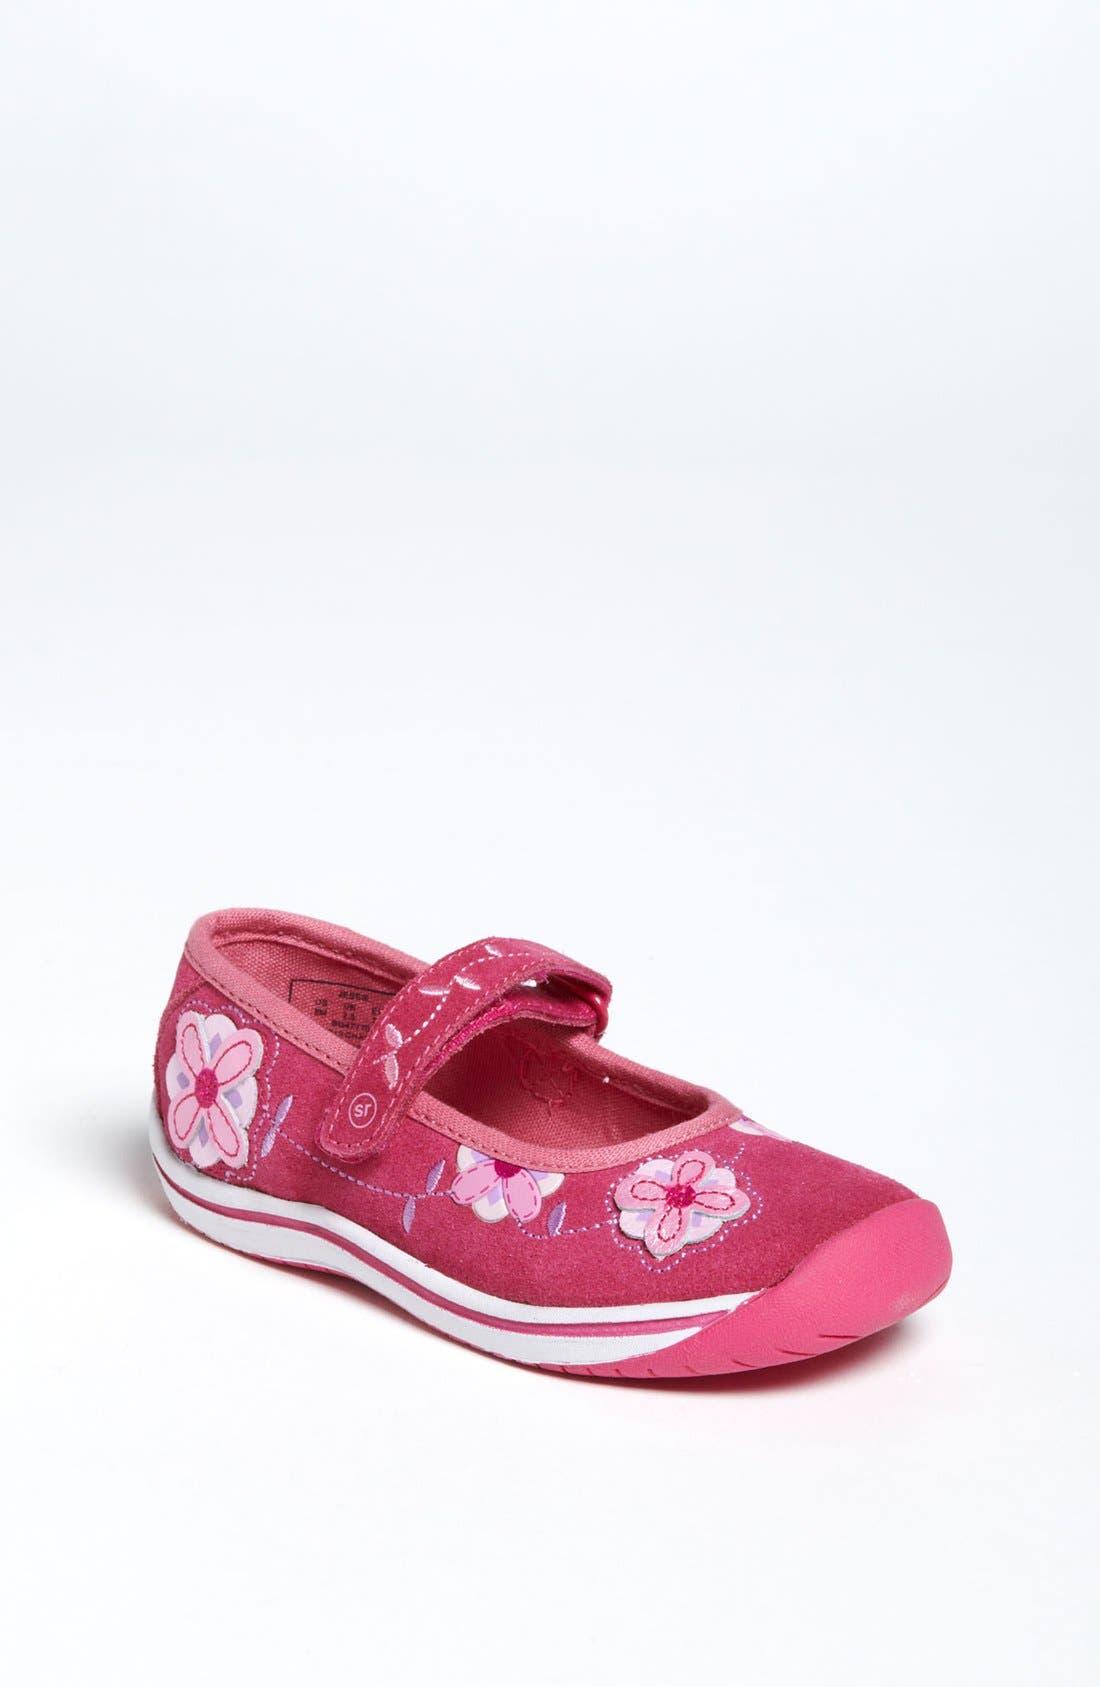 Main Image - Stride Rite 'Jessie' Mary Jane Sneaker (Baby, Walker & Toddler)